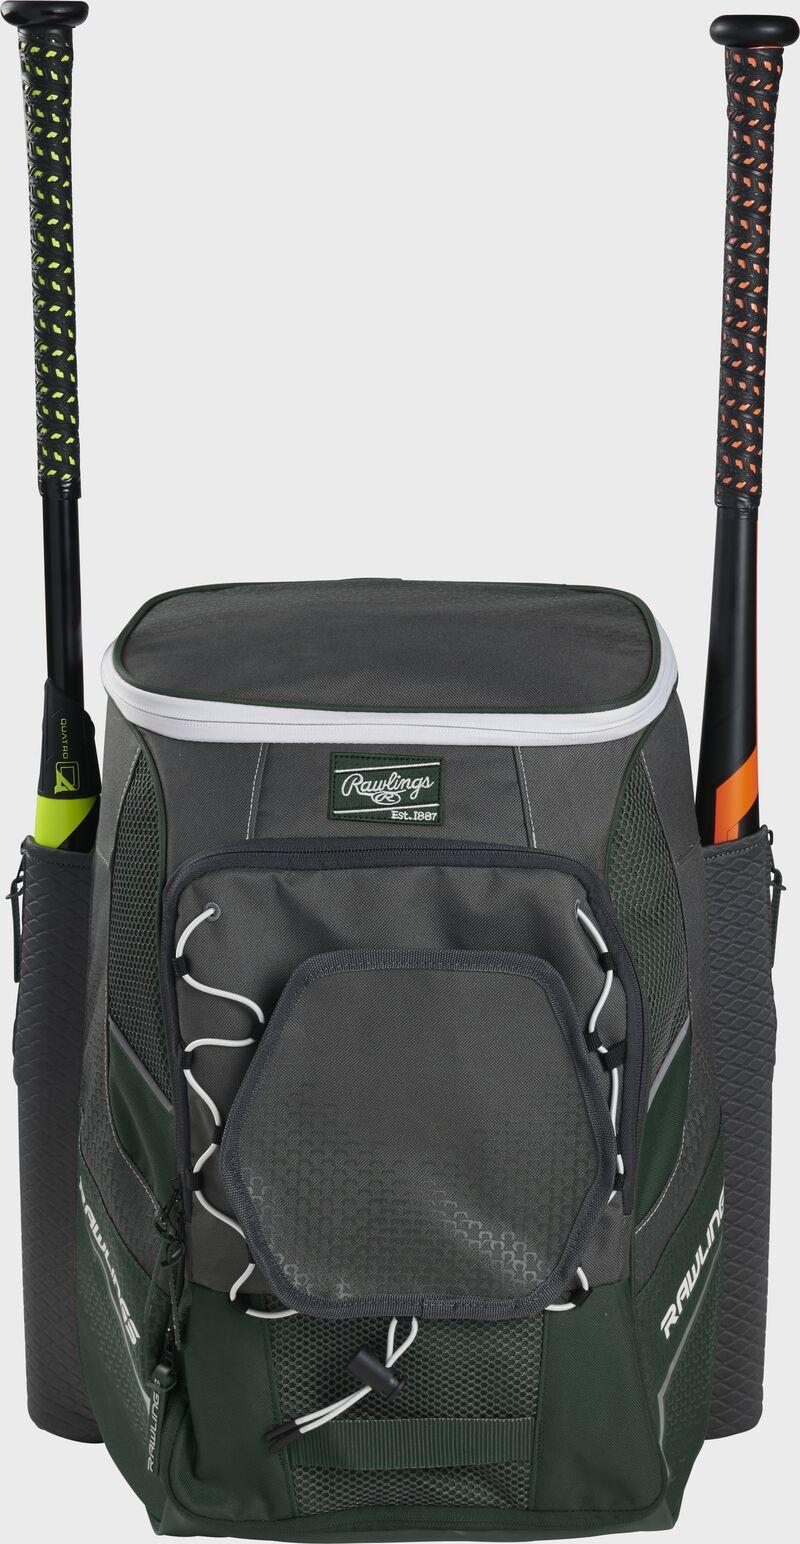 Front of a dark green Rawlings Impulse bag with a dark green Rawlings patch and two bats in the sides - SKU: IMPLSE-DG